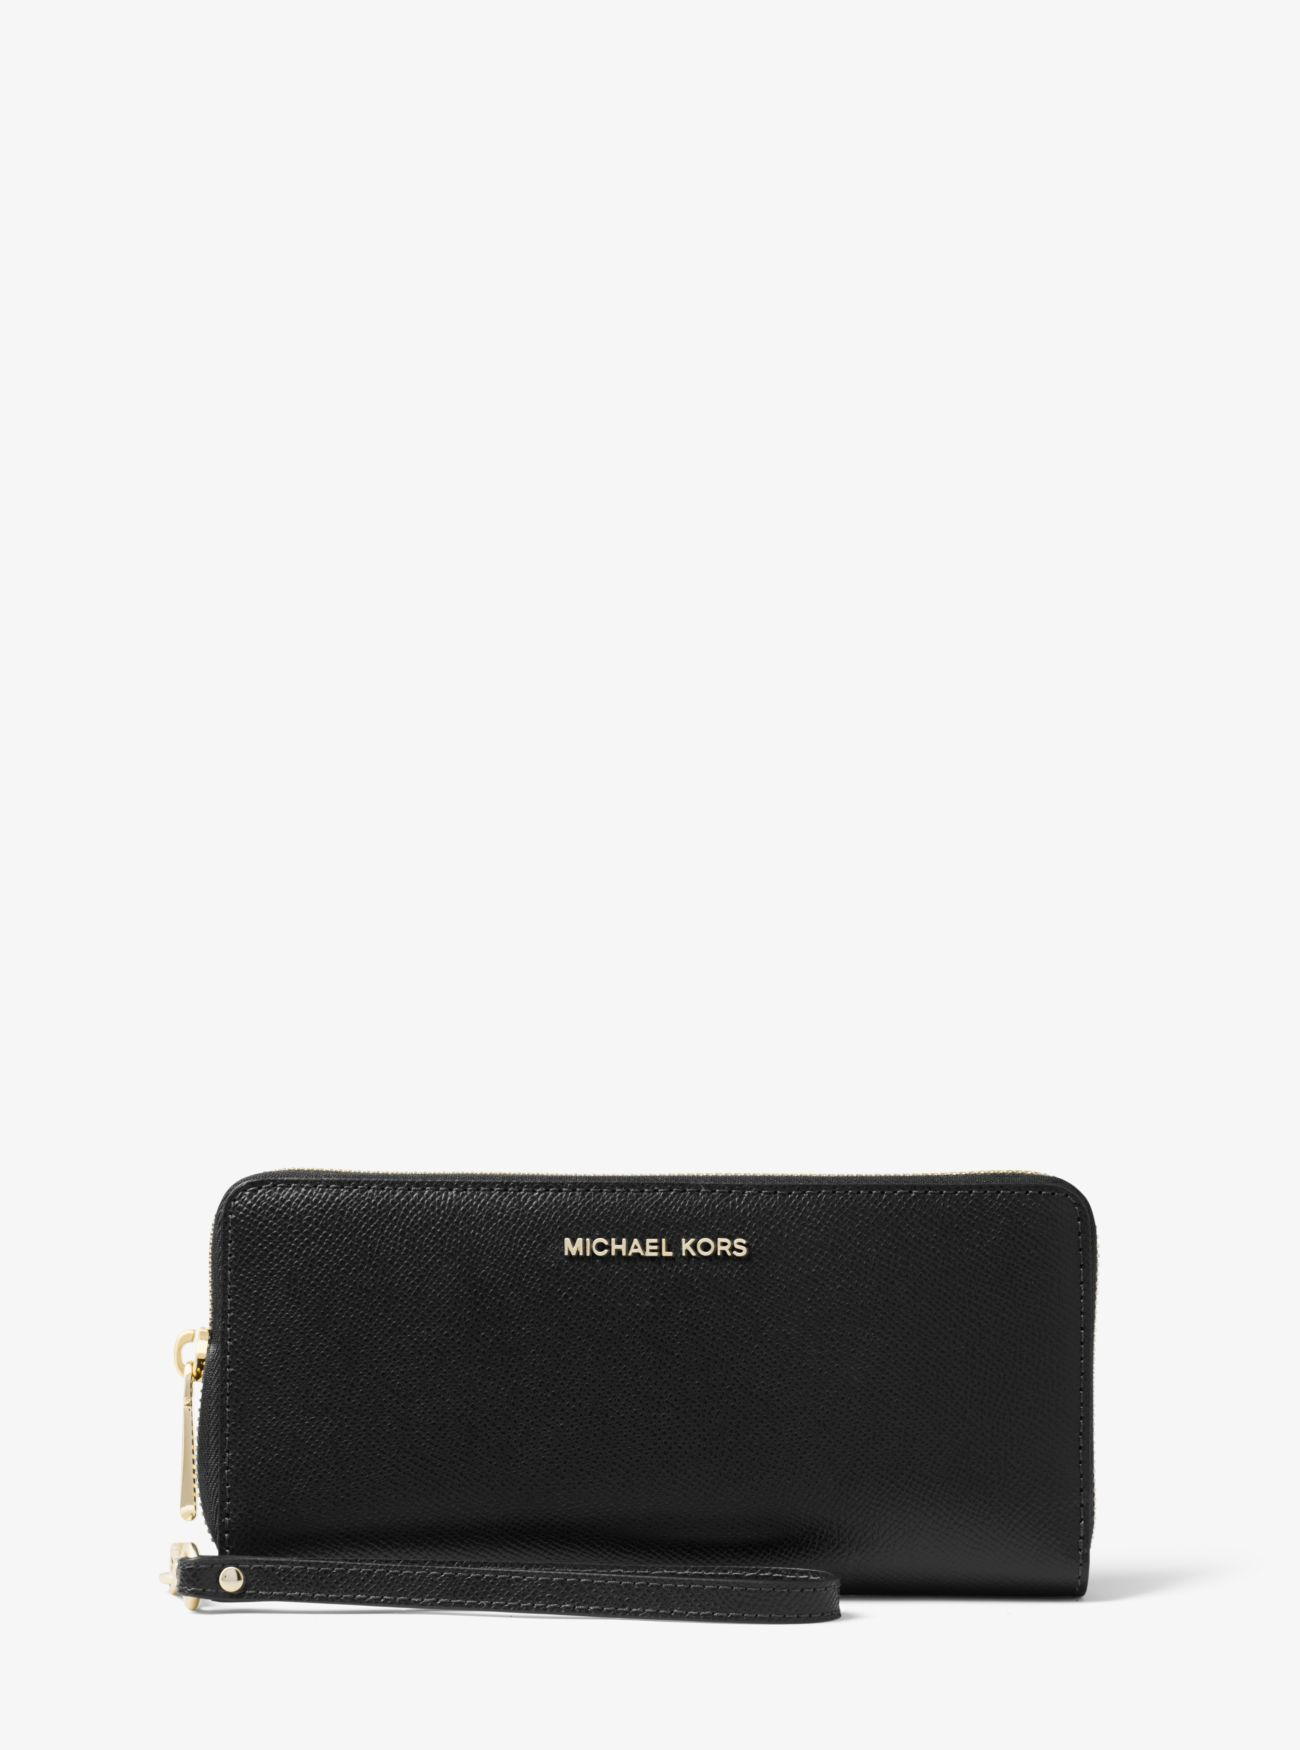 Michael kors bags in dubai - Jet Set Travel Leather Continental Wristlet